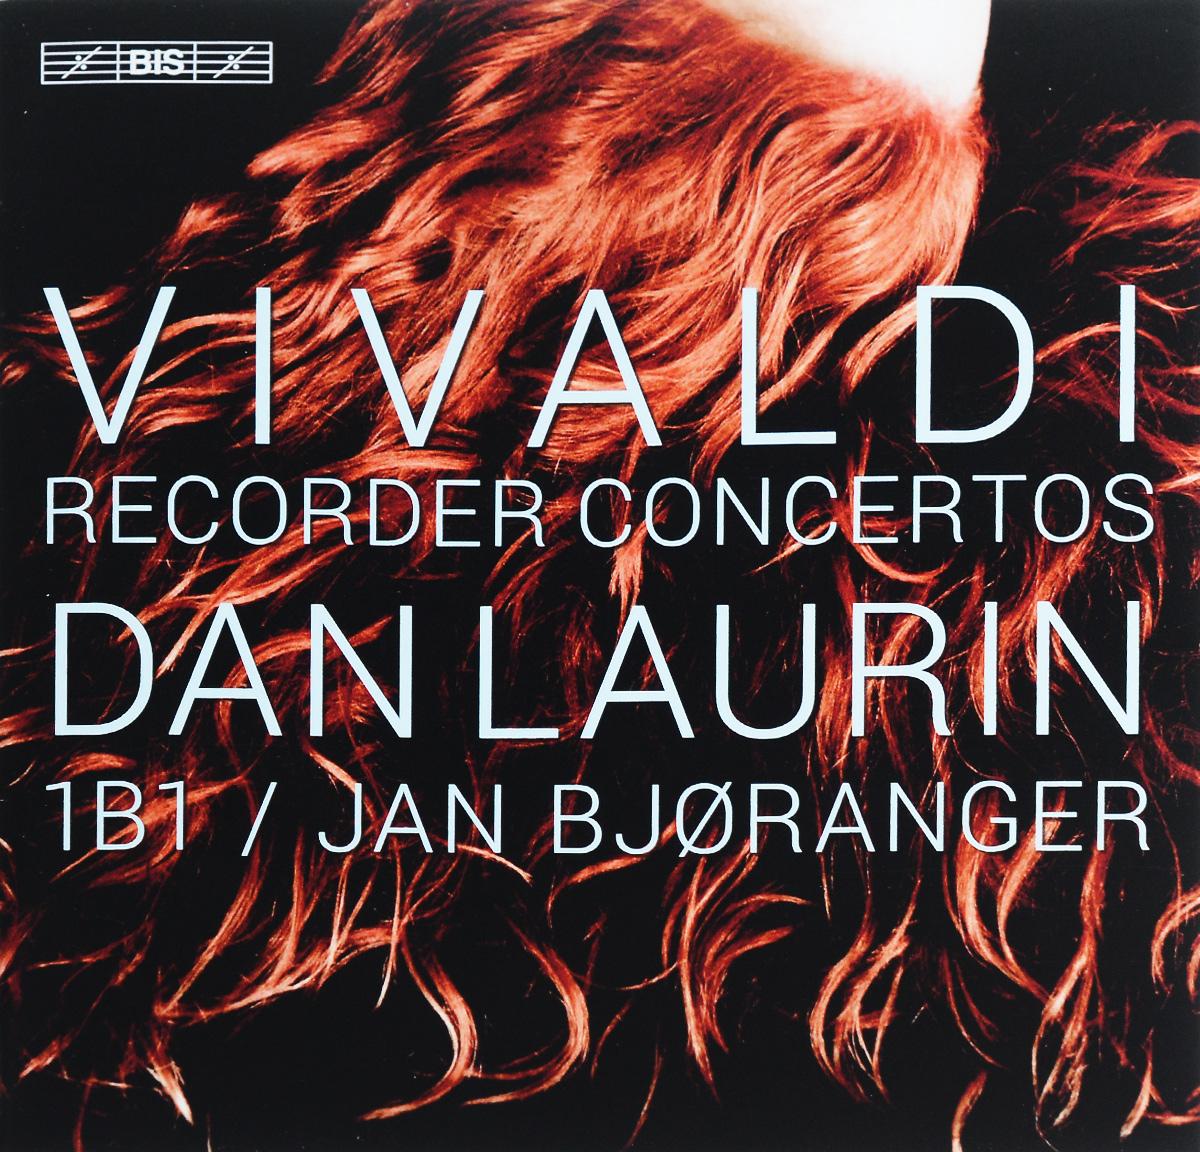 Ден Лаурин,1B1,Jan Bjoranger,Anna Paradiso,Jonas Nordberg Dan Laurin. Vivaldi. Recorder Concertos (SACD)